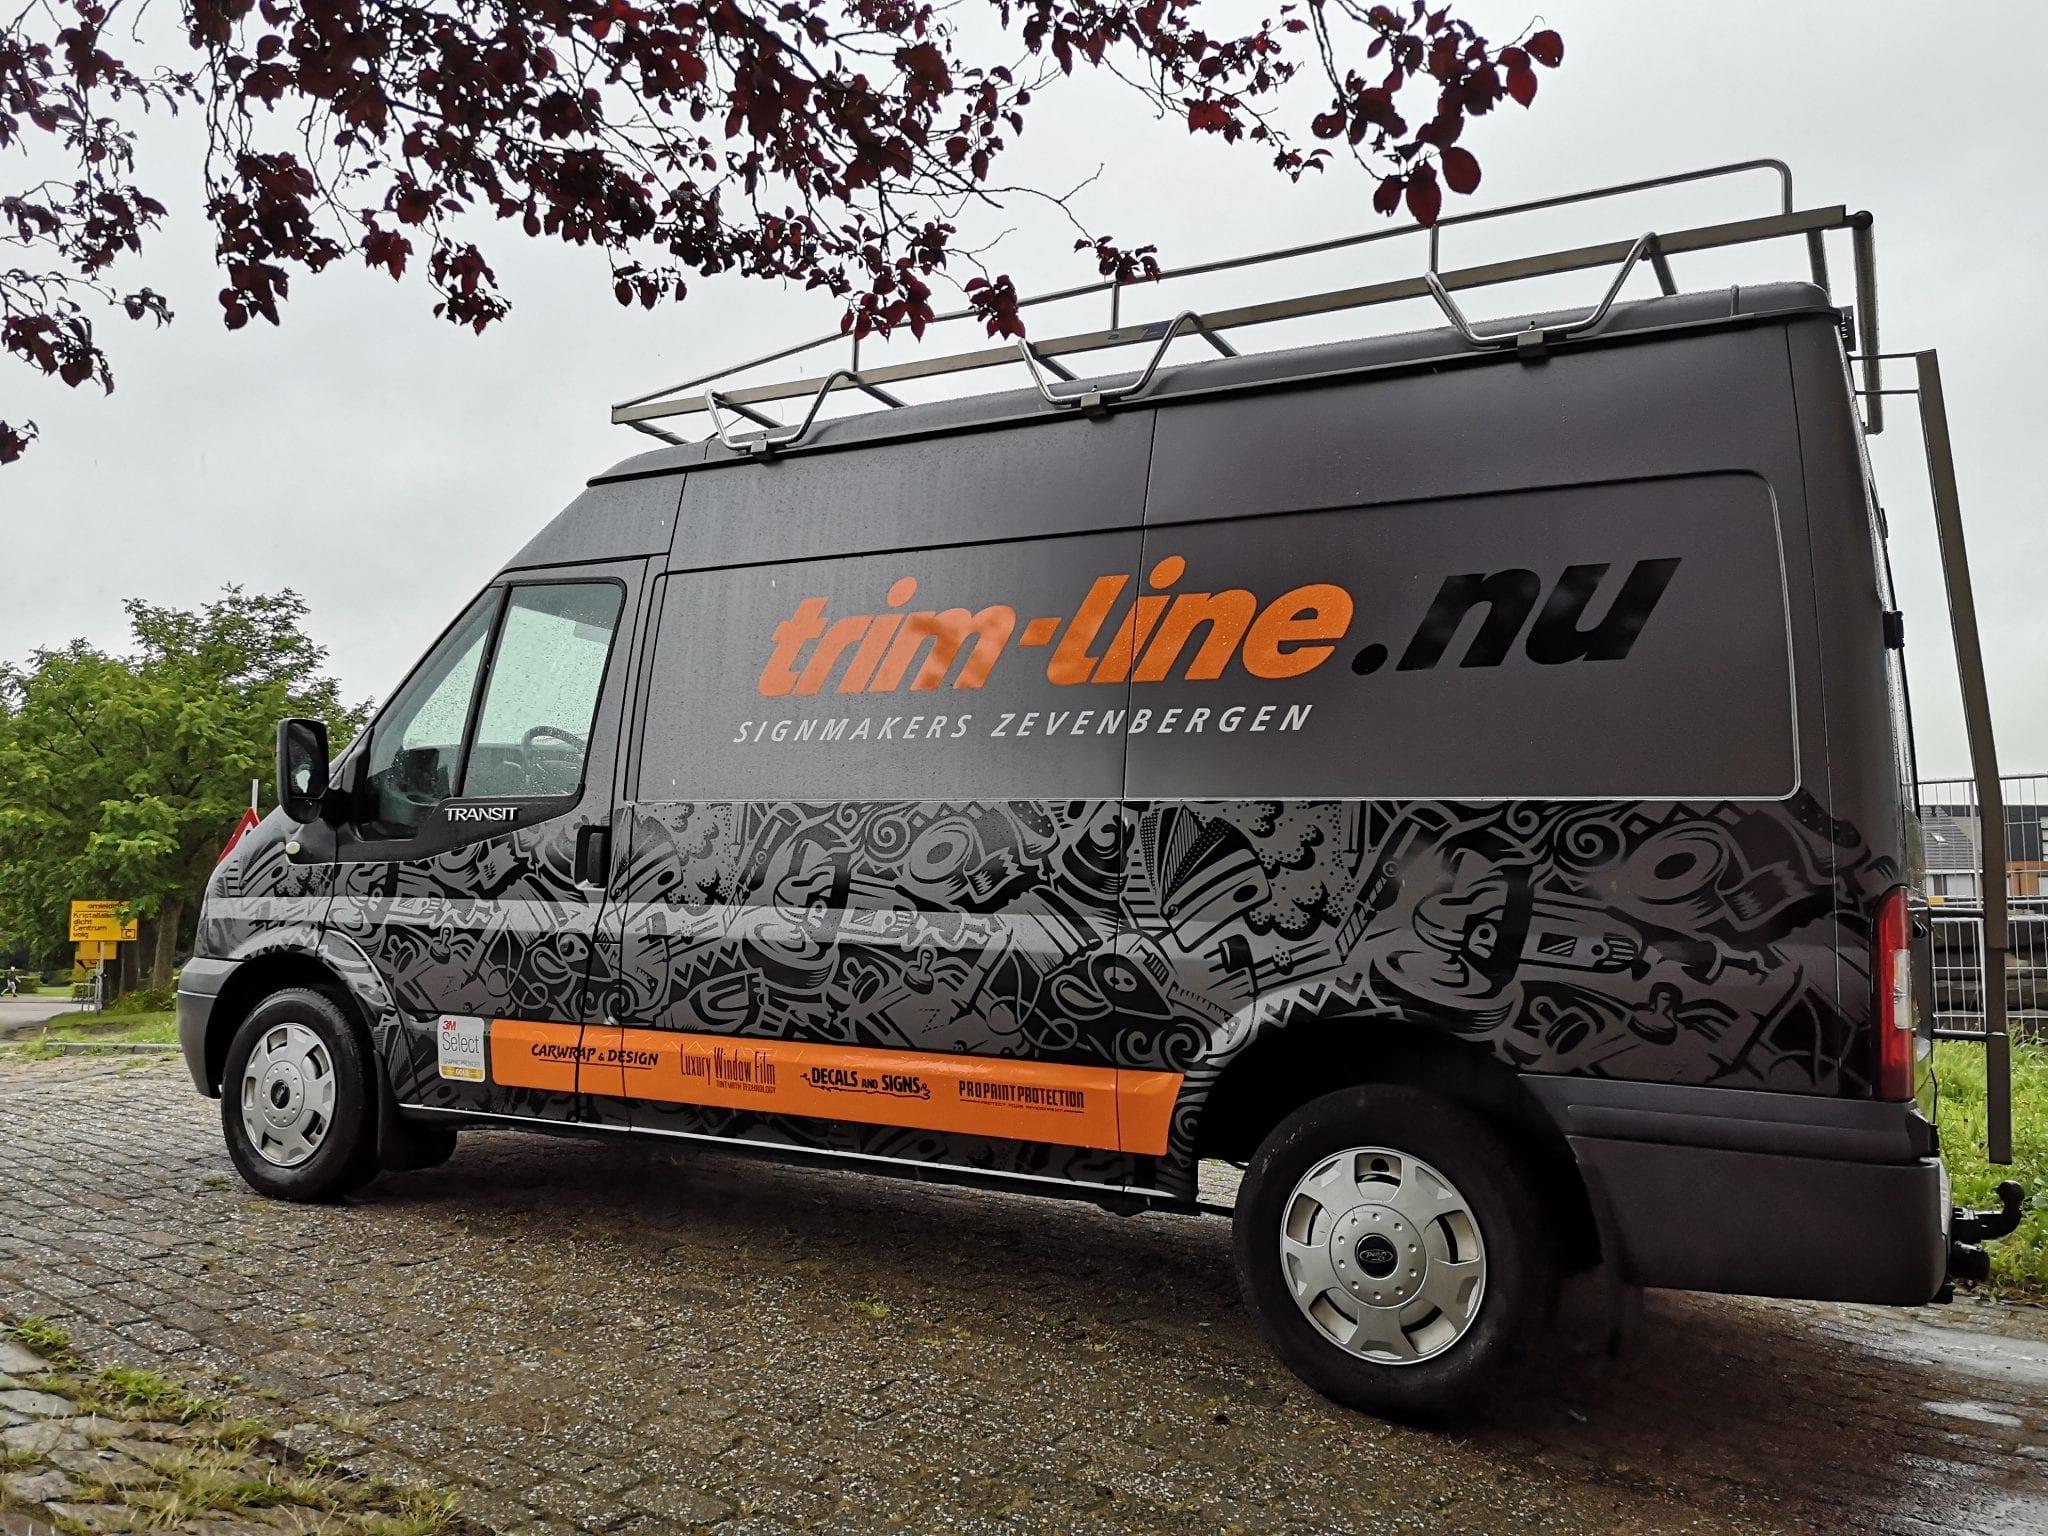 Trim-Line Bus | Trim-Line Zevenbergen